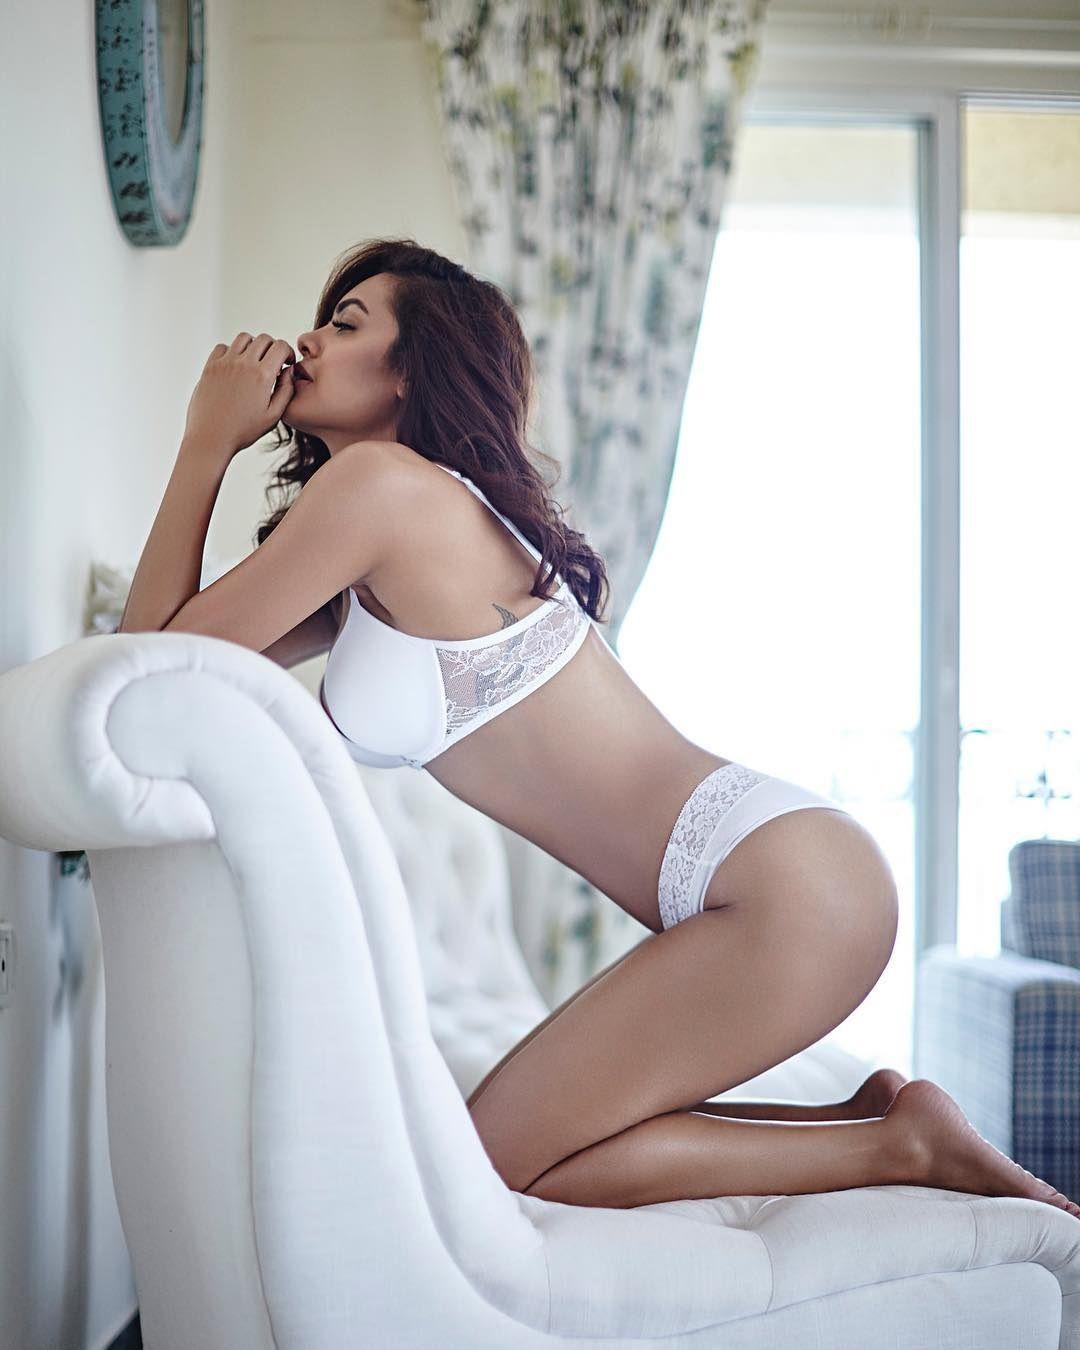 best of Manila nude hot Actress